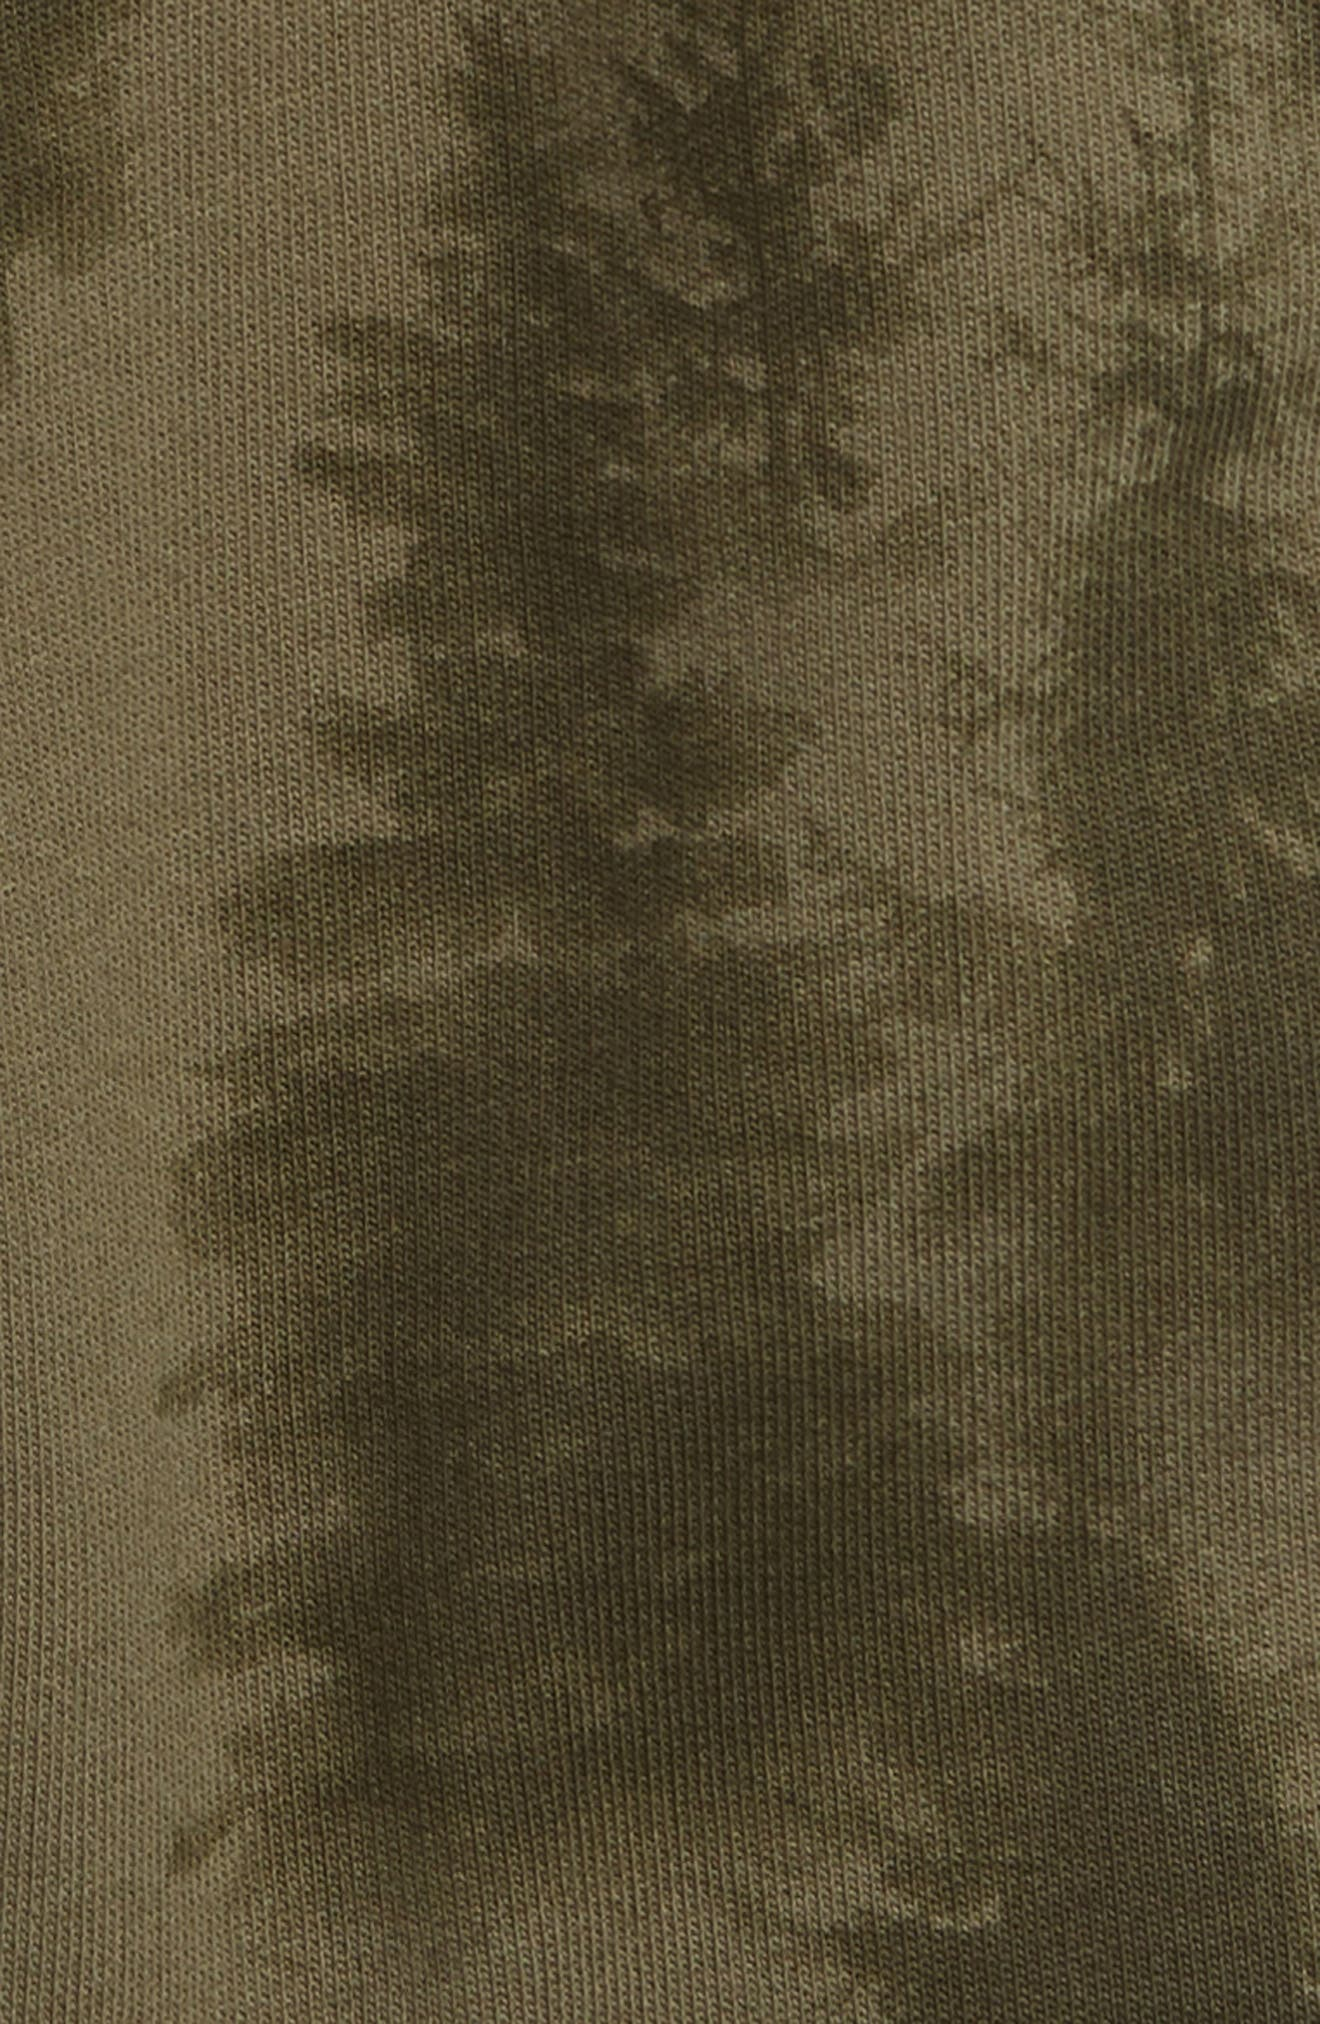 Print Jogger Pants,                             Alternate thumbnail 2, color,                             WALK IN THE WOODS CAMO